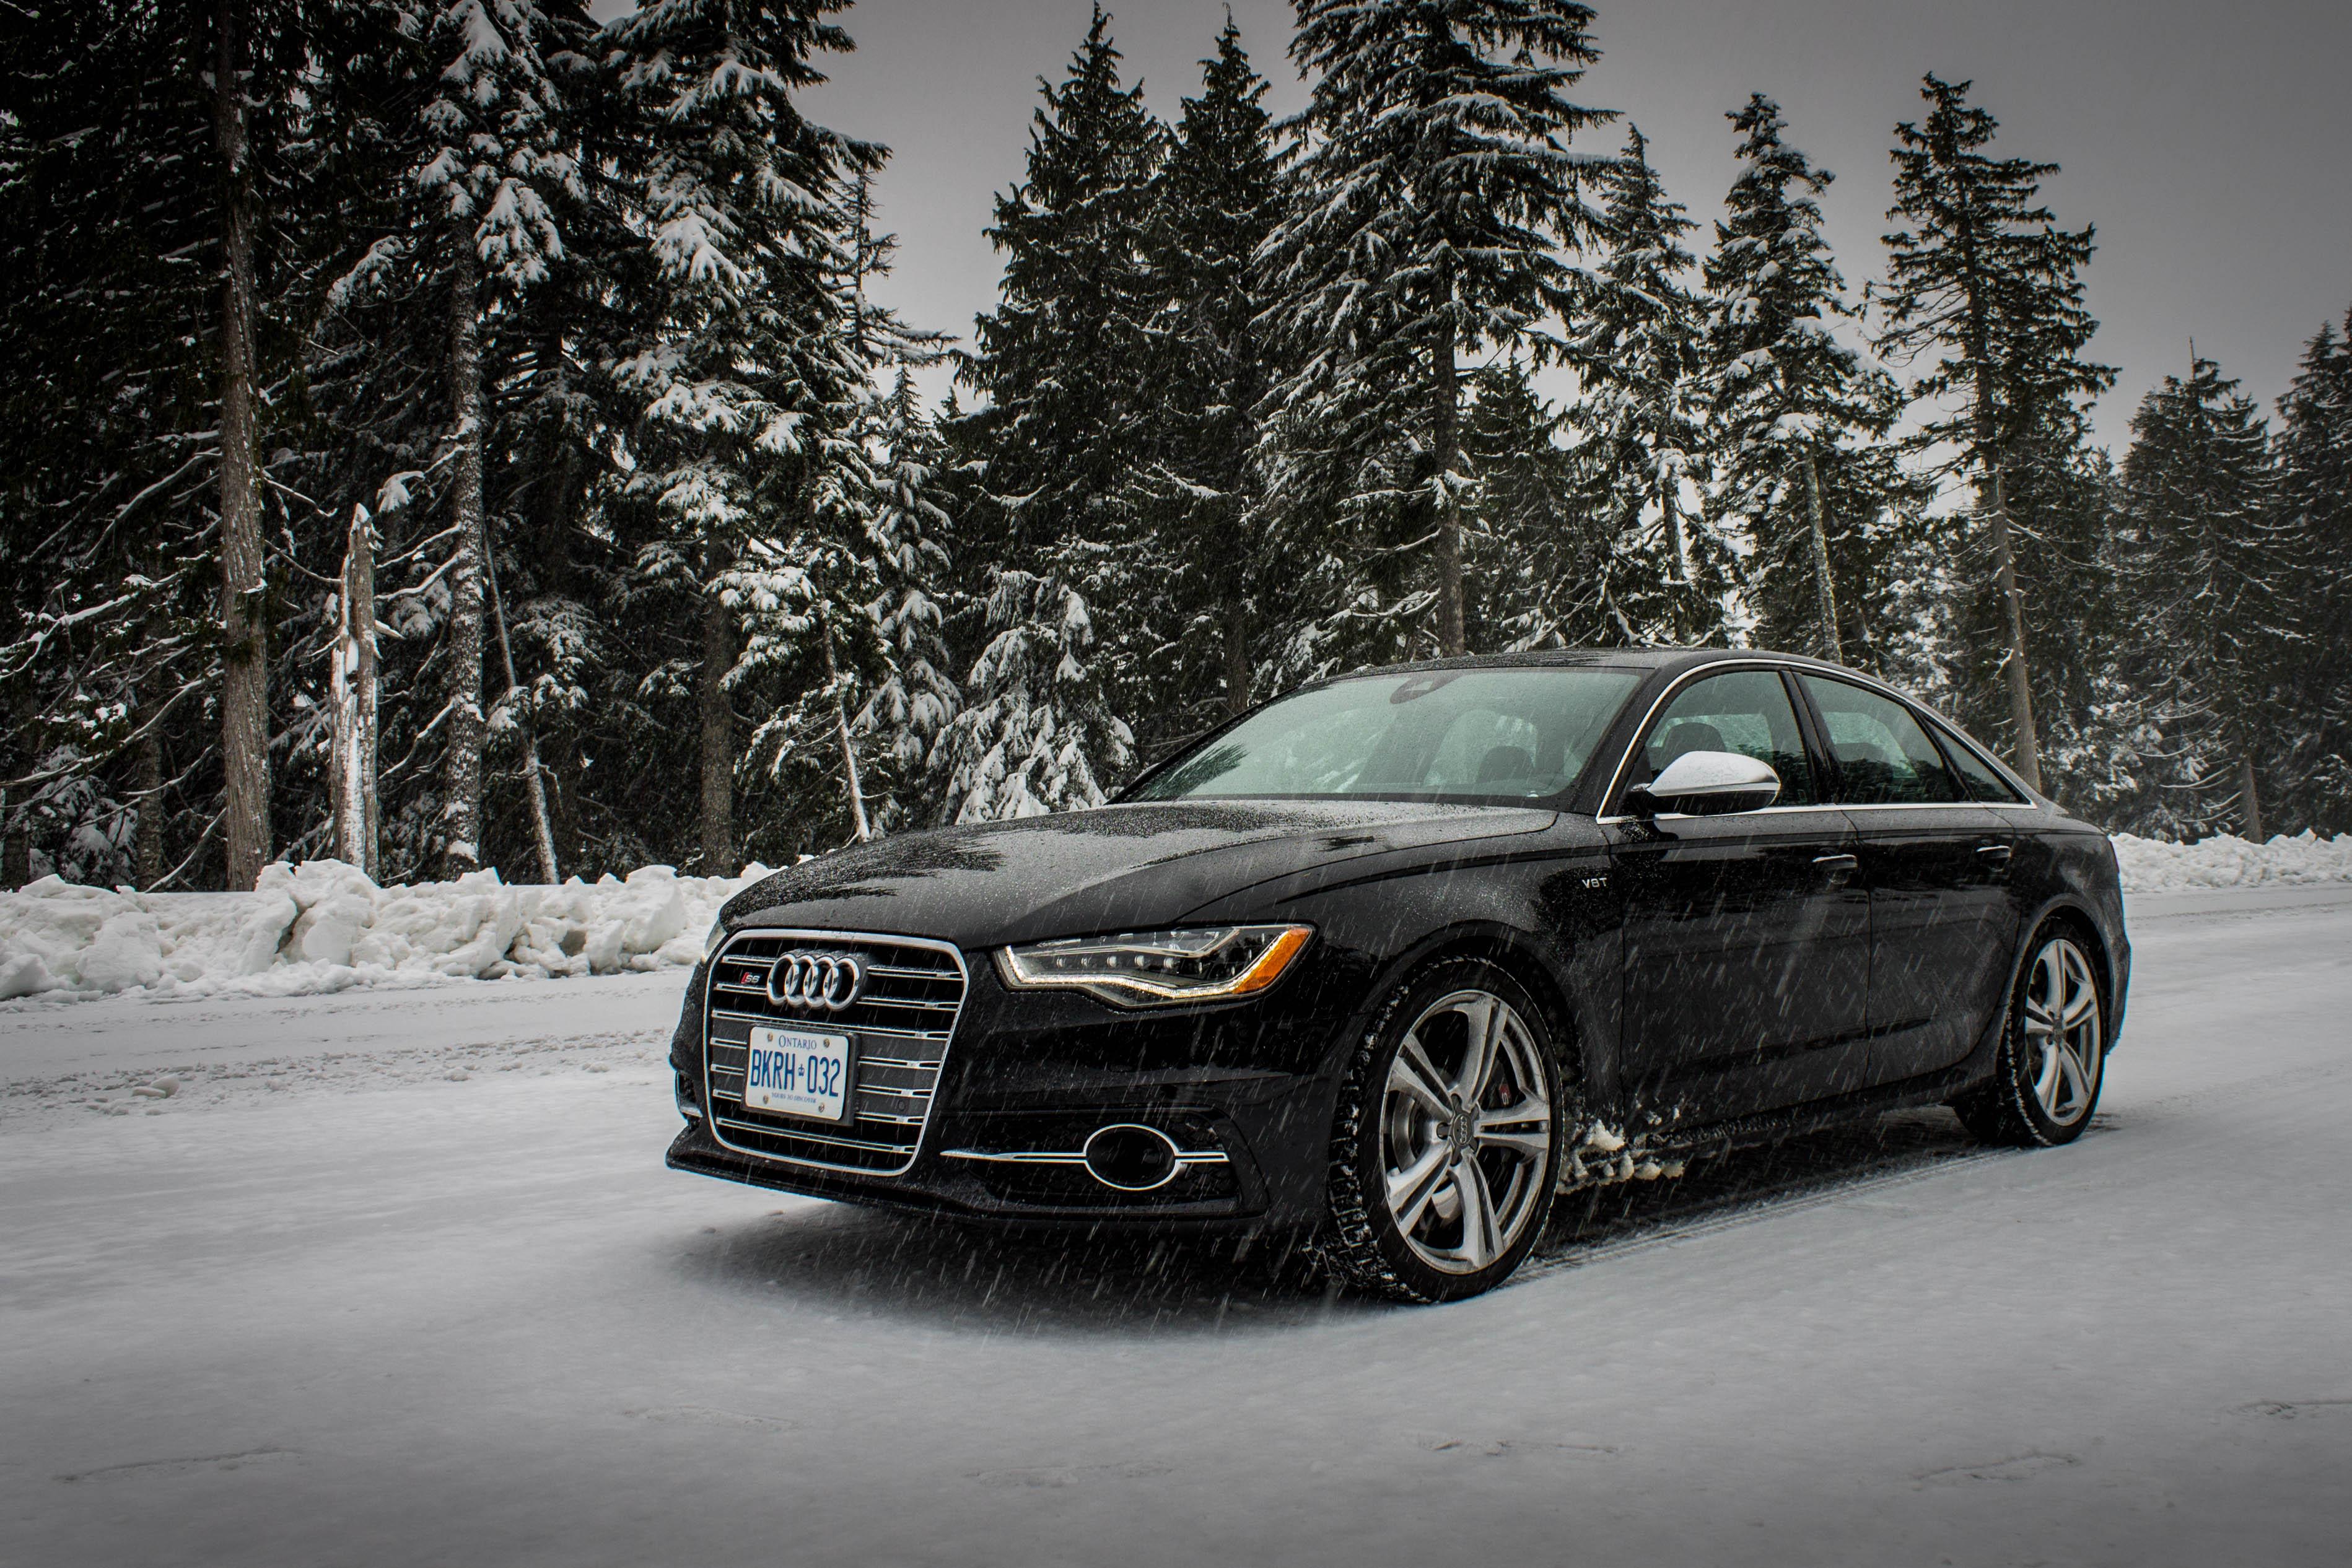 Audi S Information And Photos ZombieDrive - Audi car origin